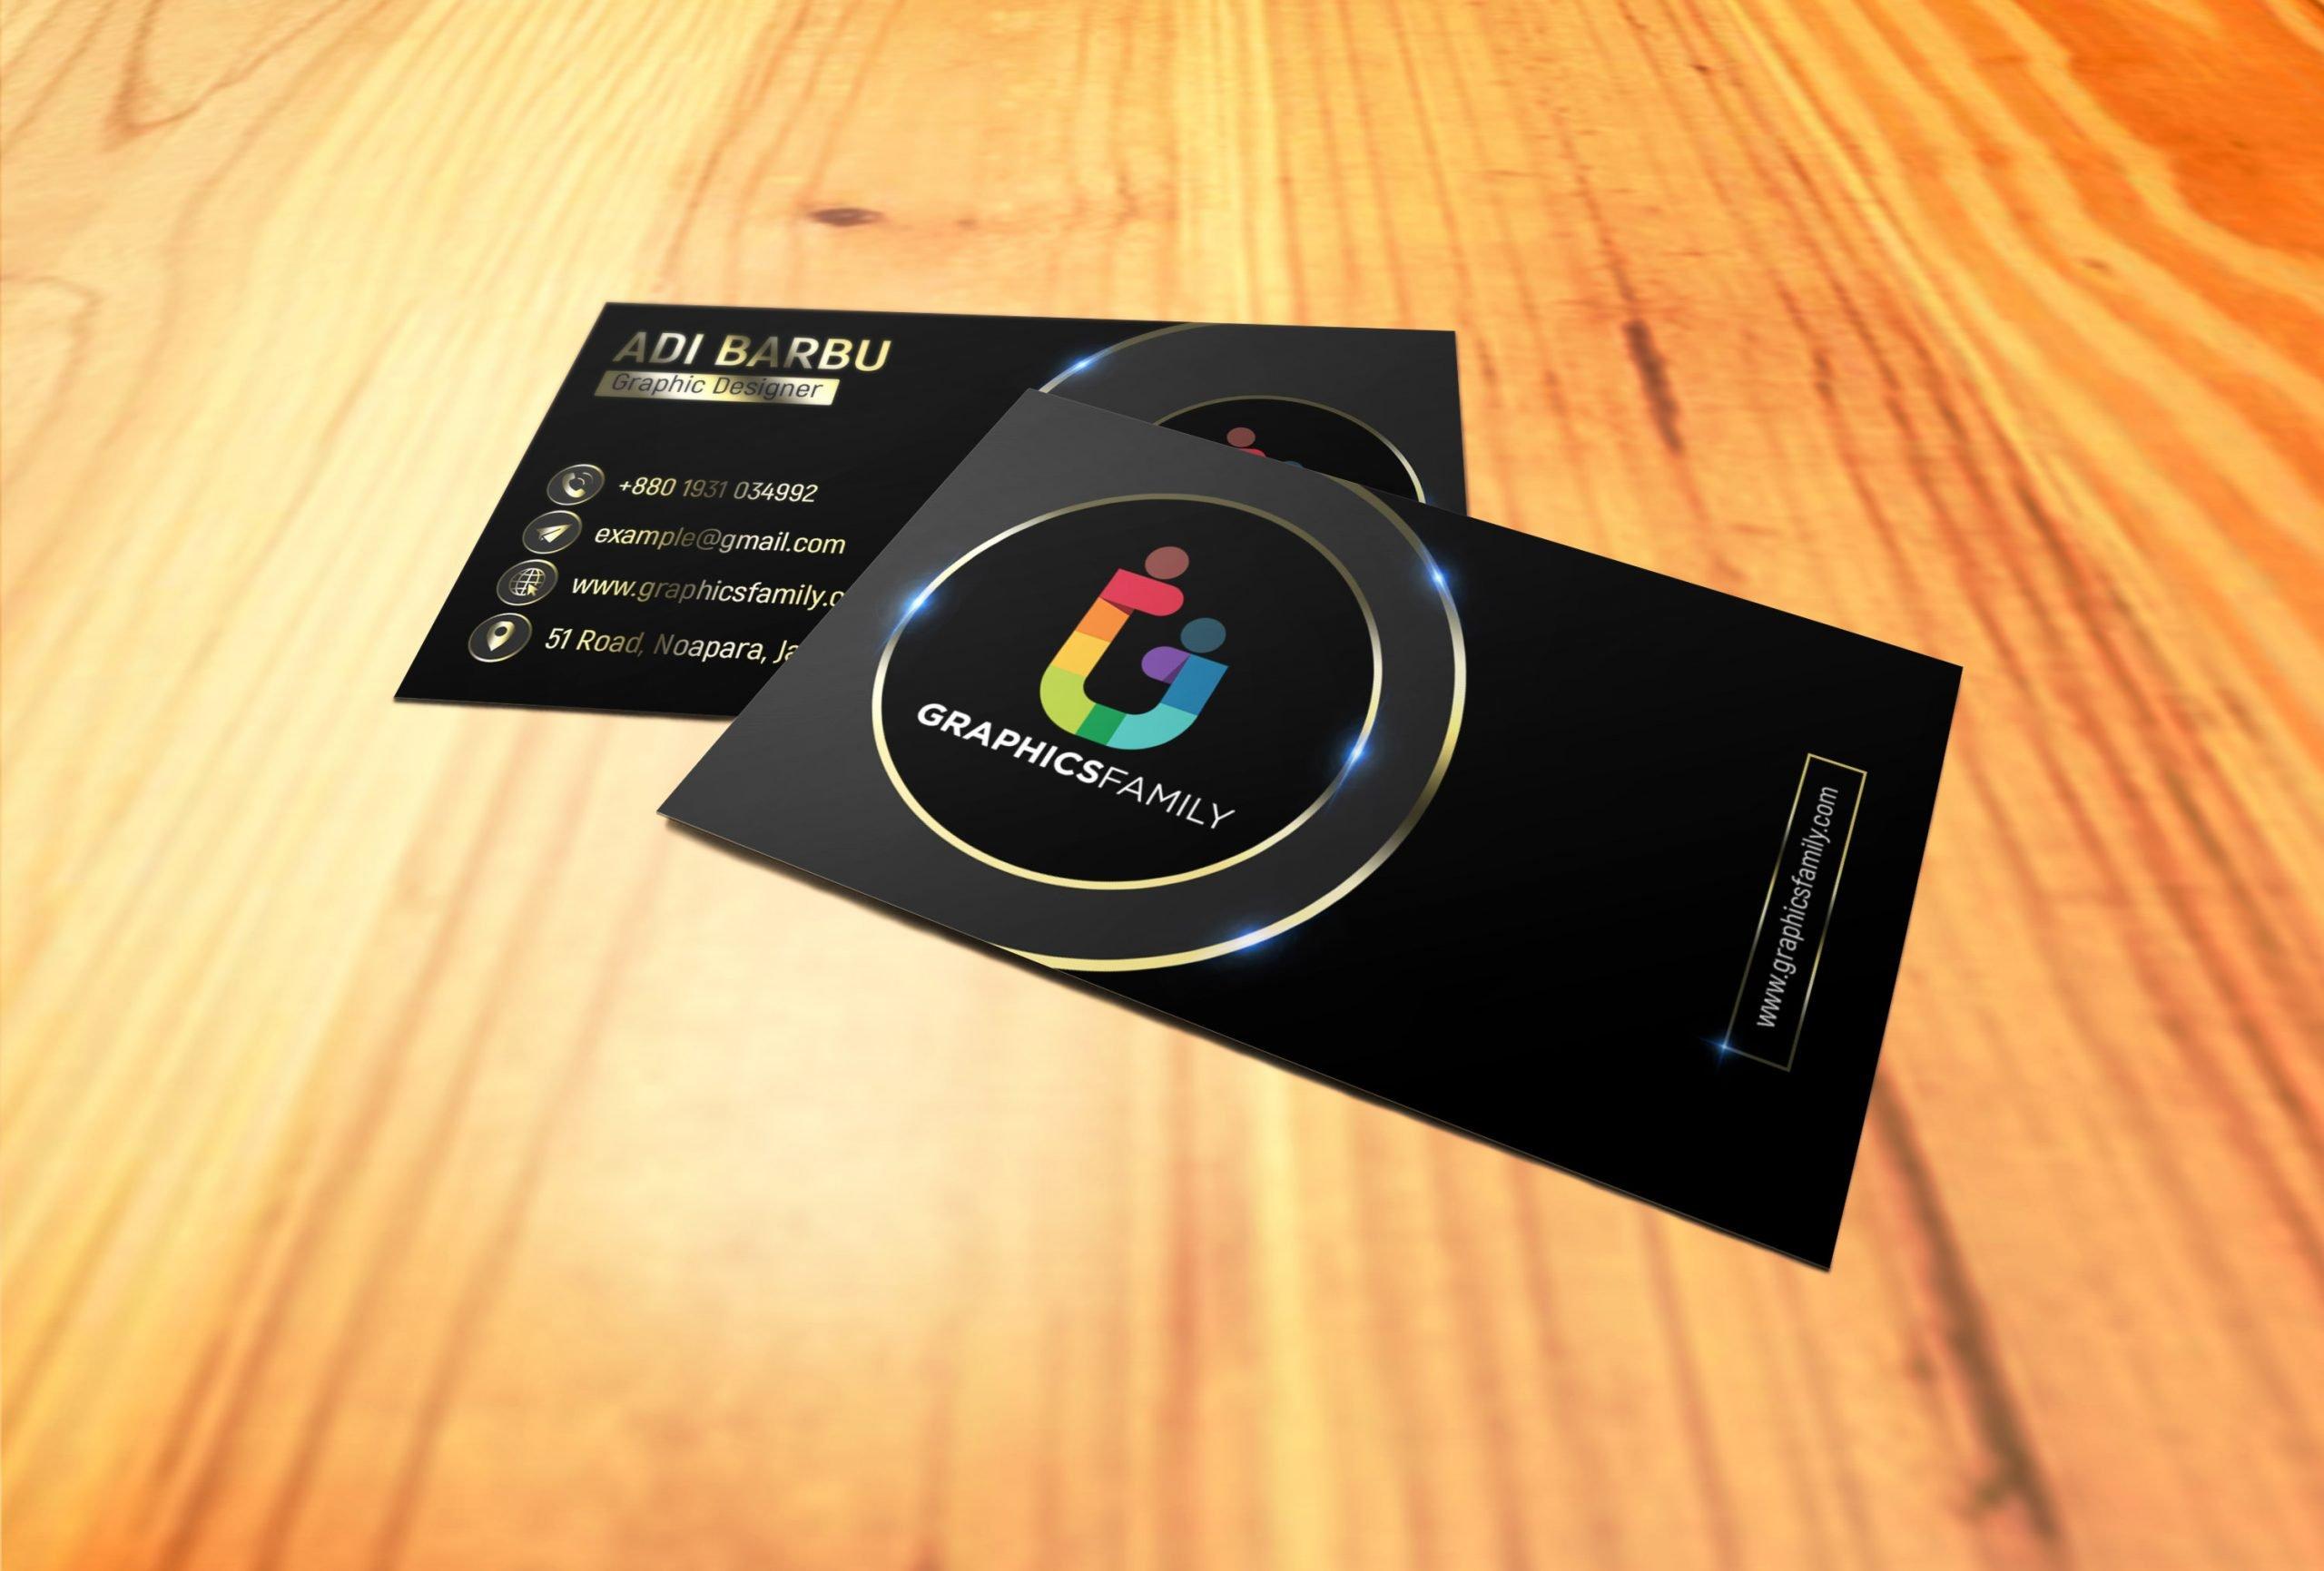 Gold PSD Visiting Card Design Download